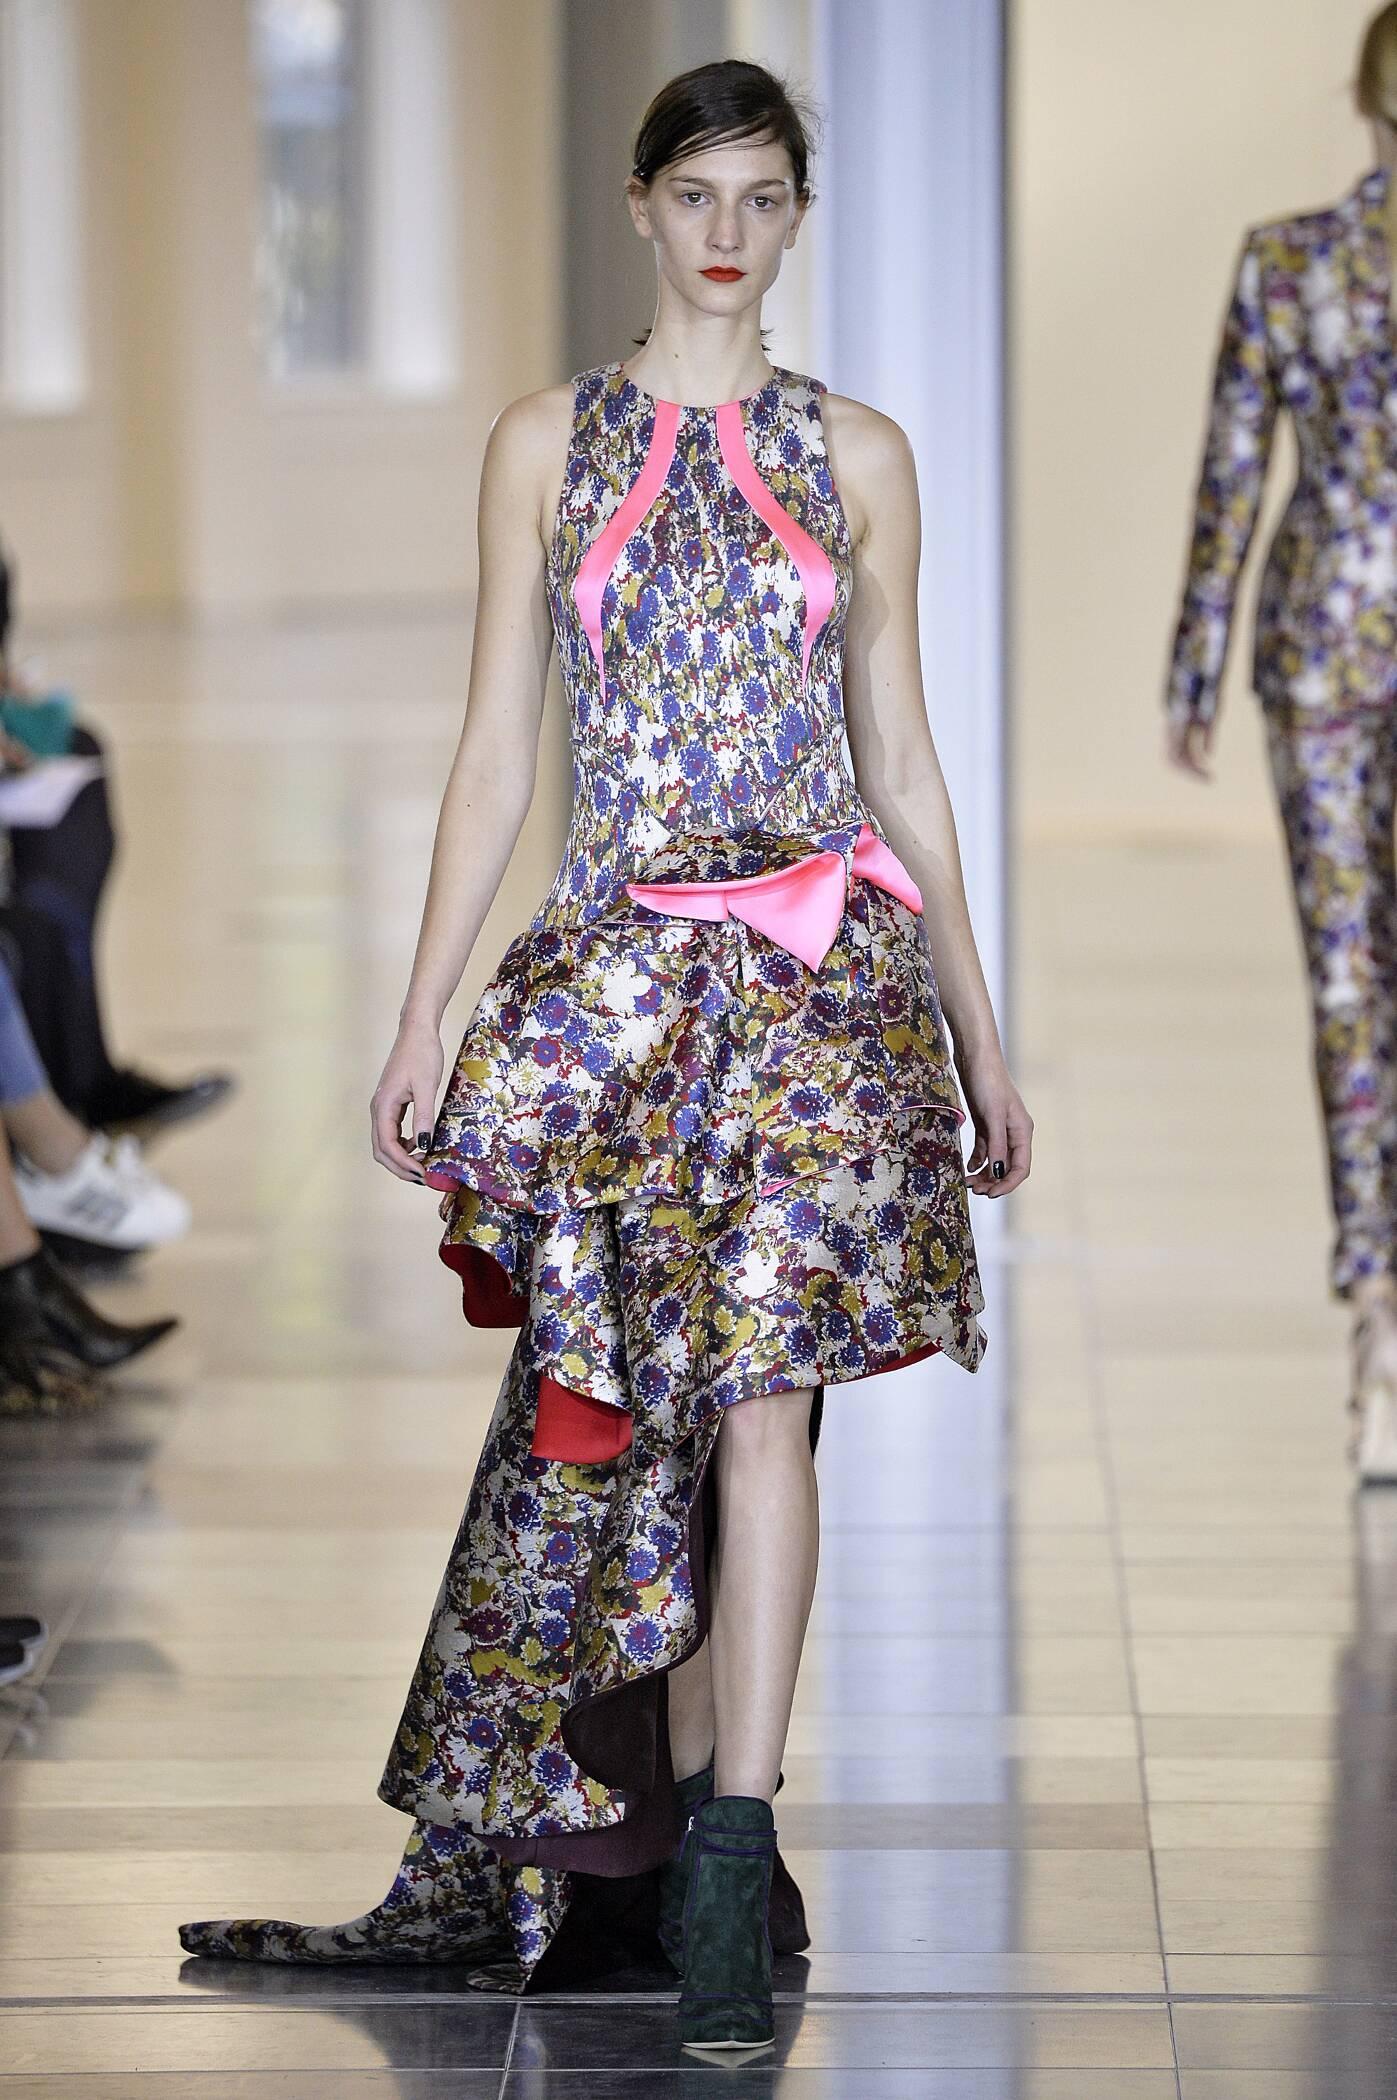 Fall Antonio Berardi Collection Fashion Women Model